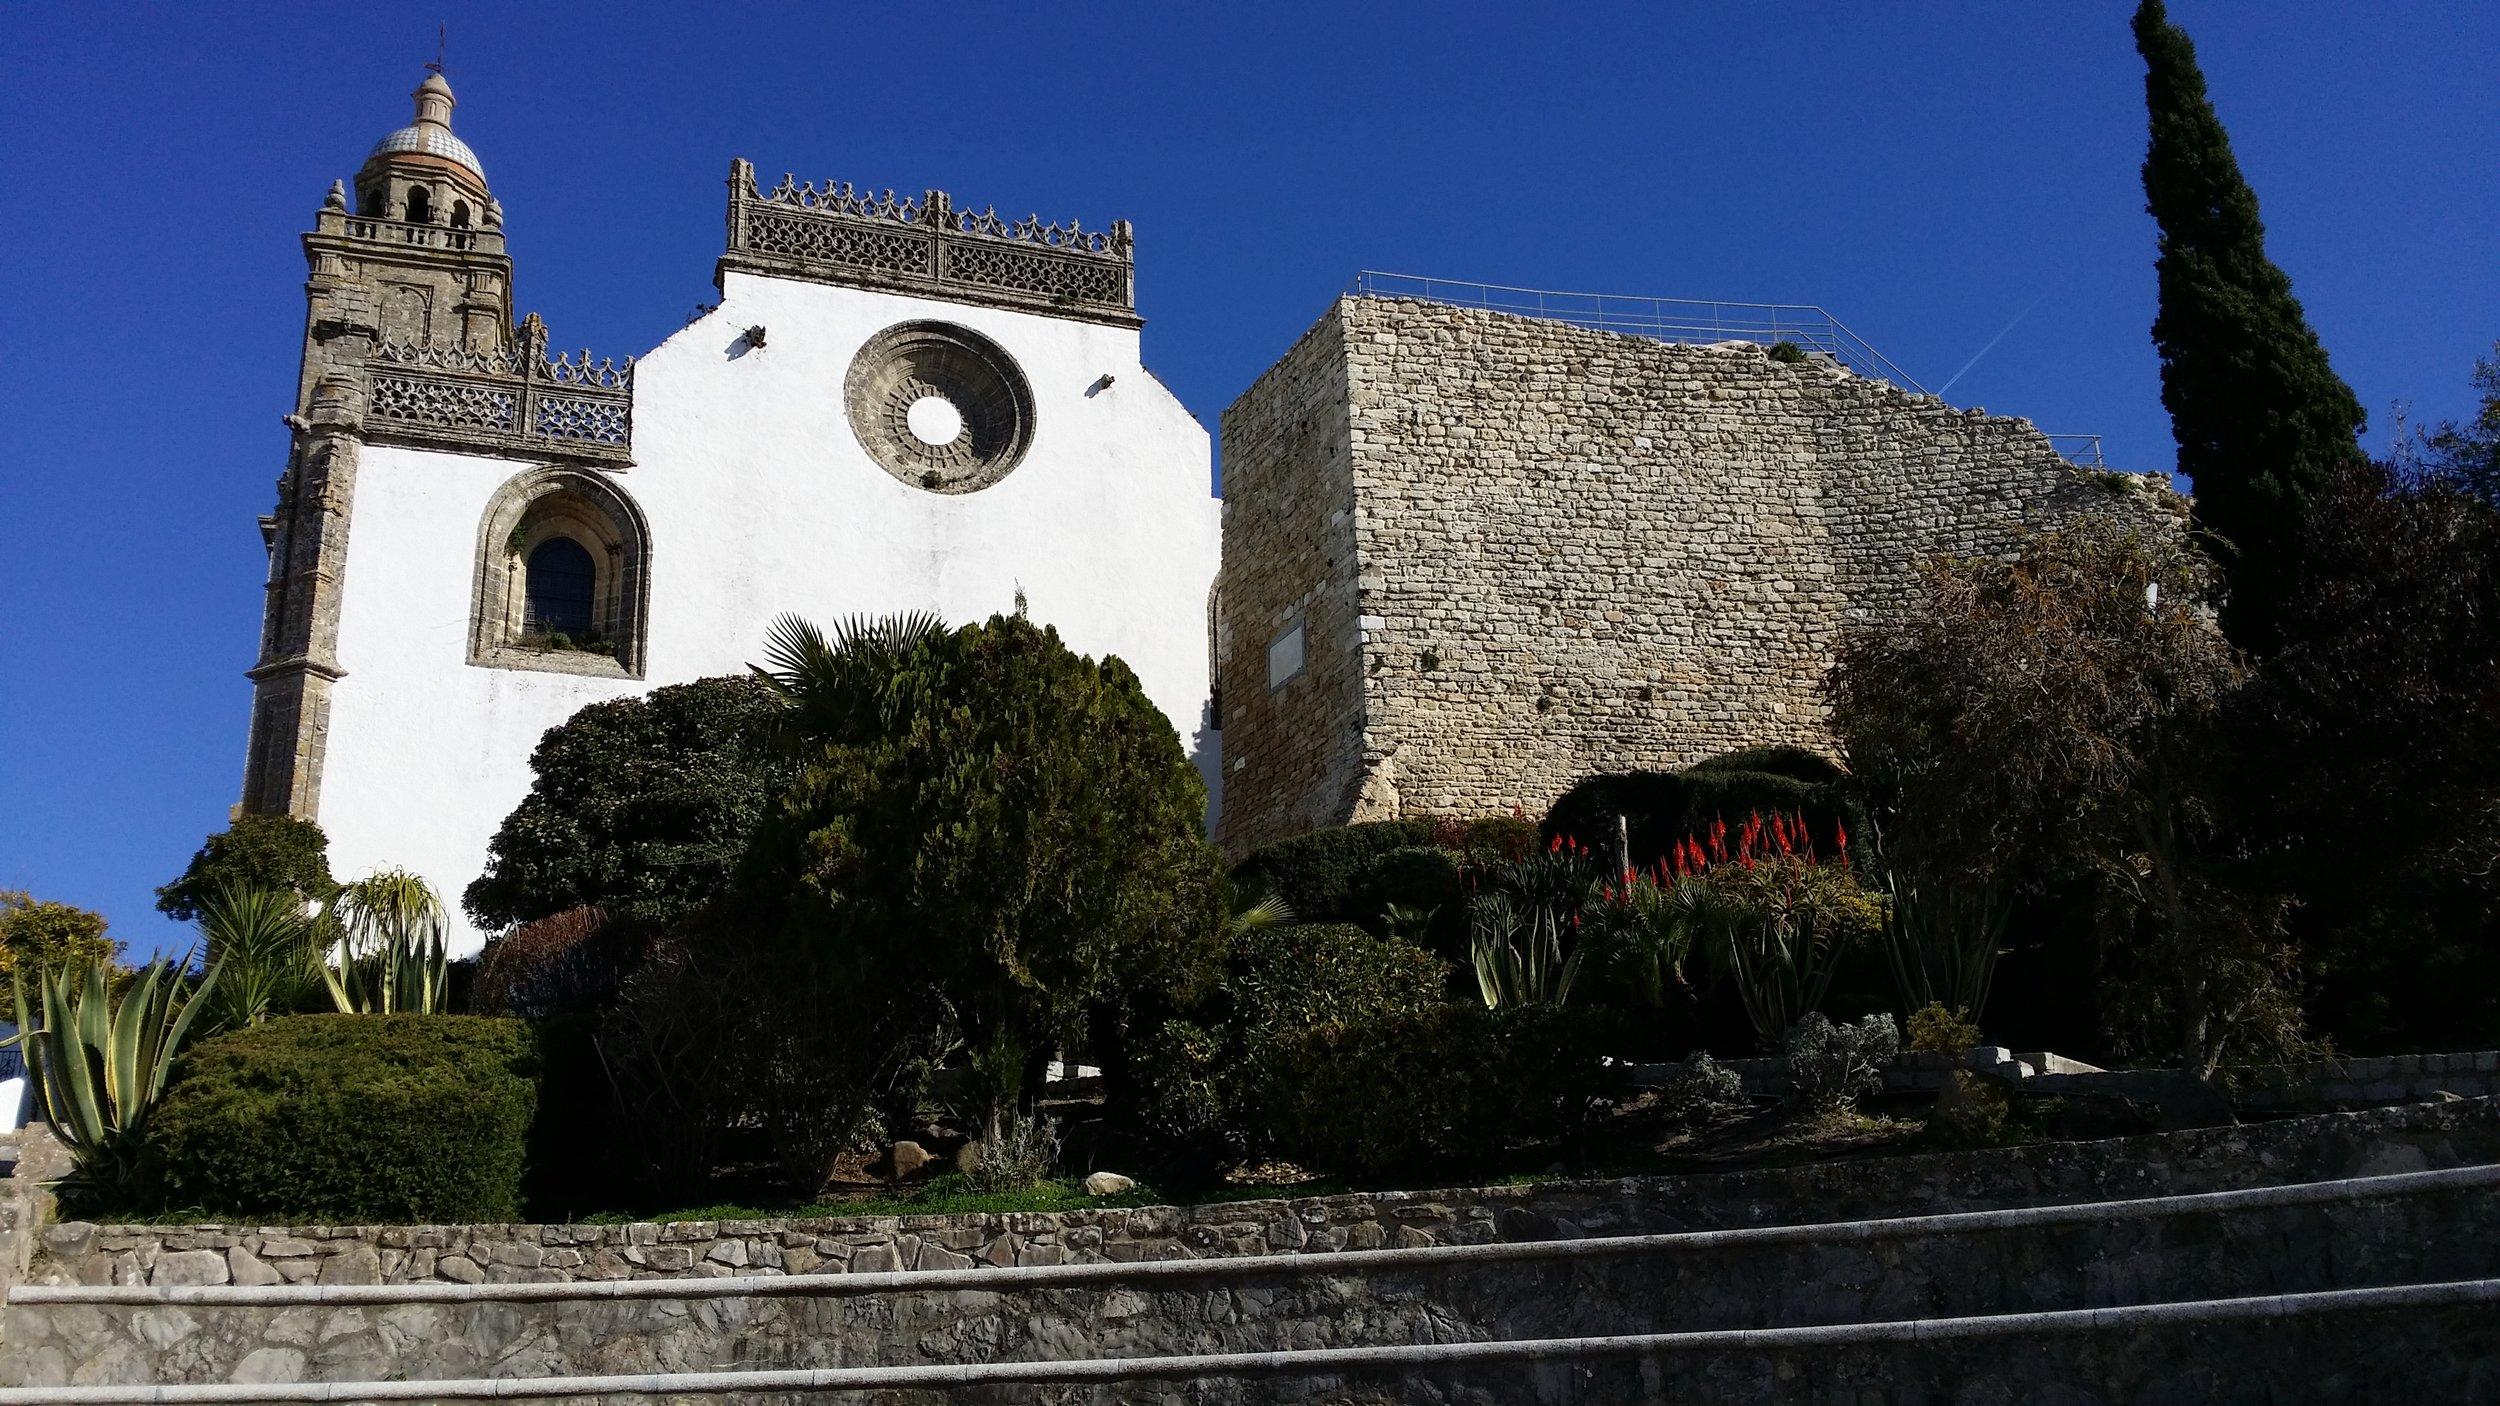 Medina Sidonia church